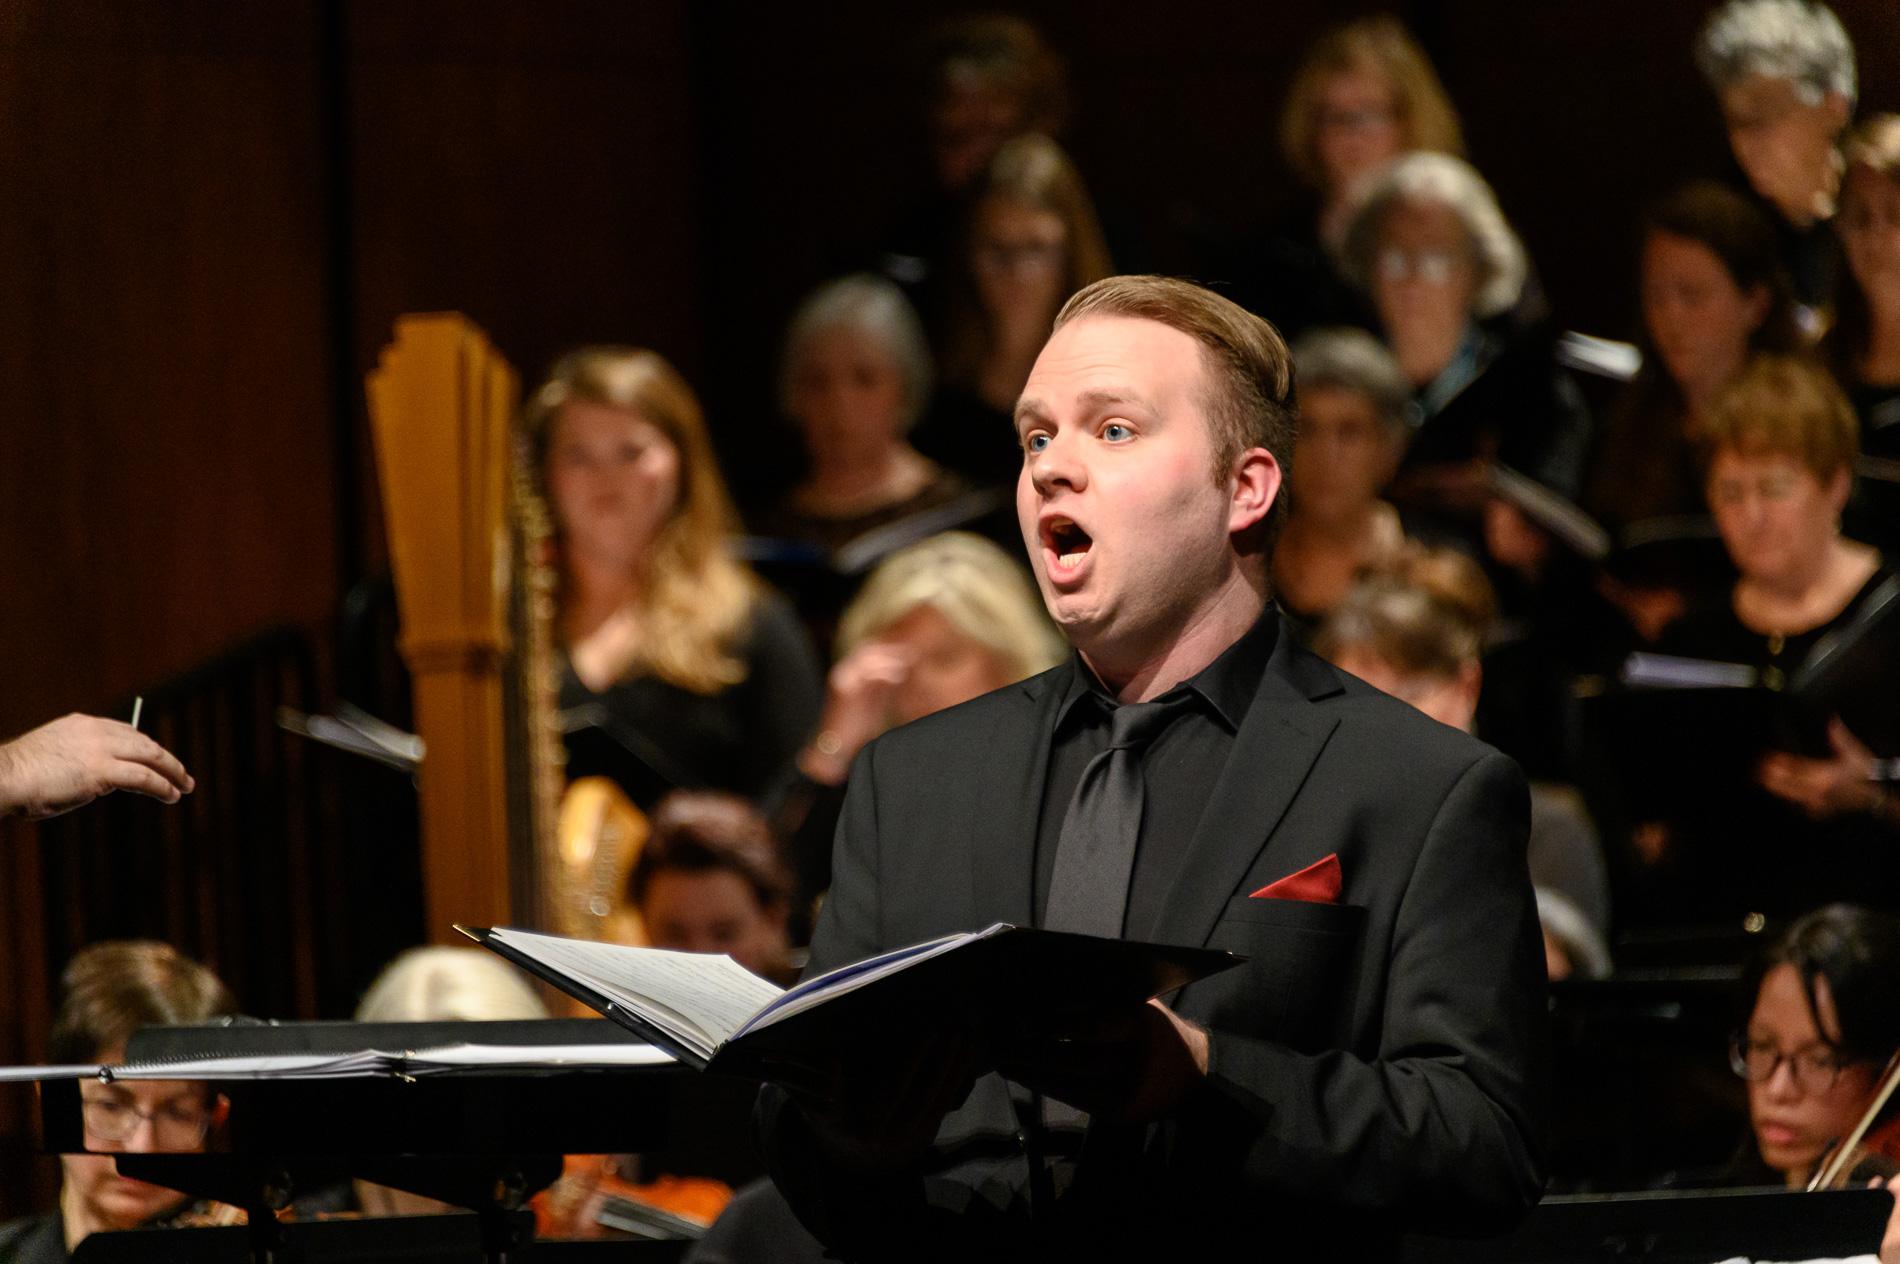 Vashon Island Chorale (tenor soloist)